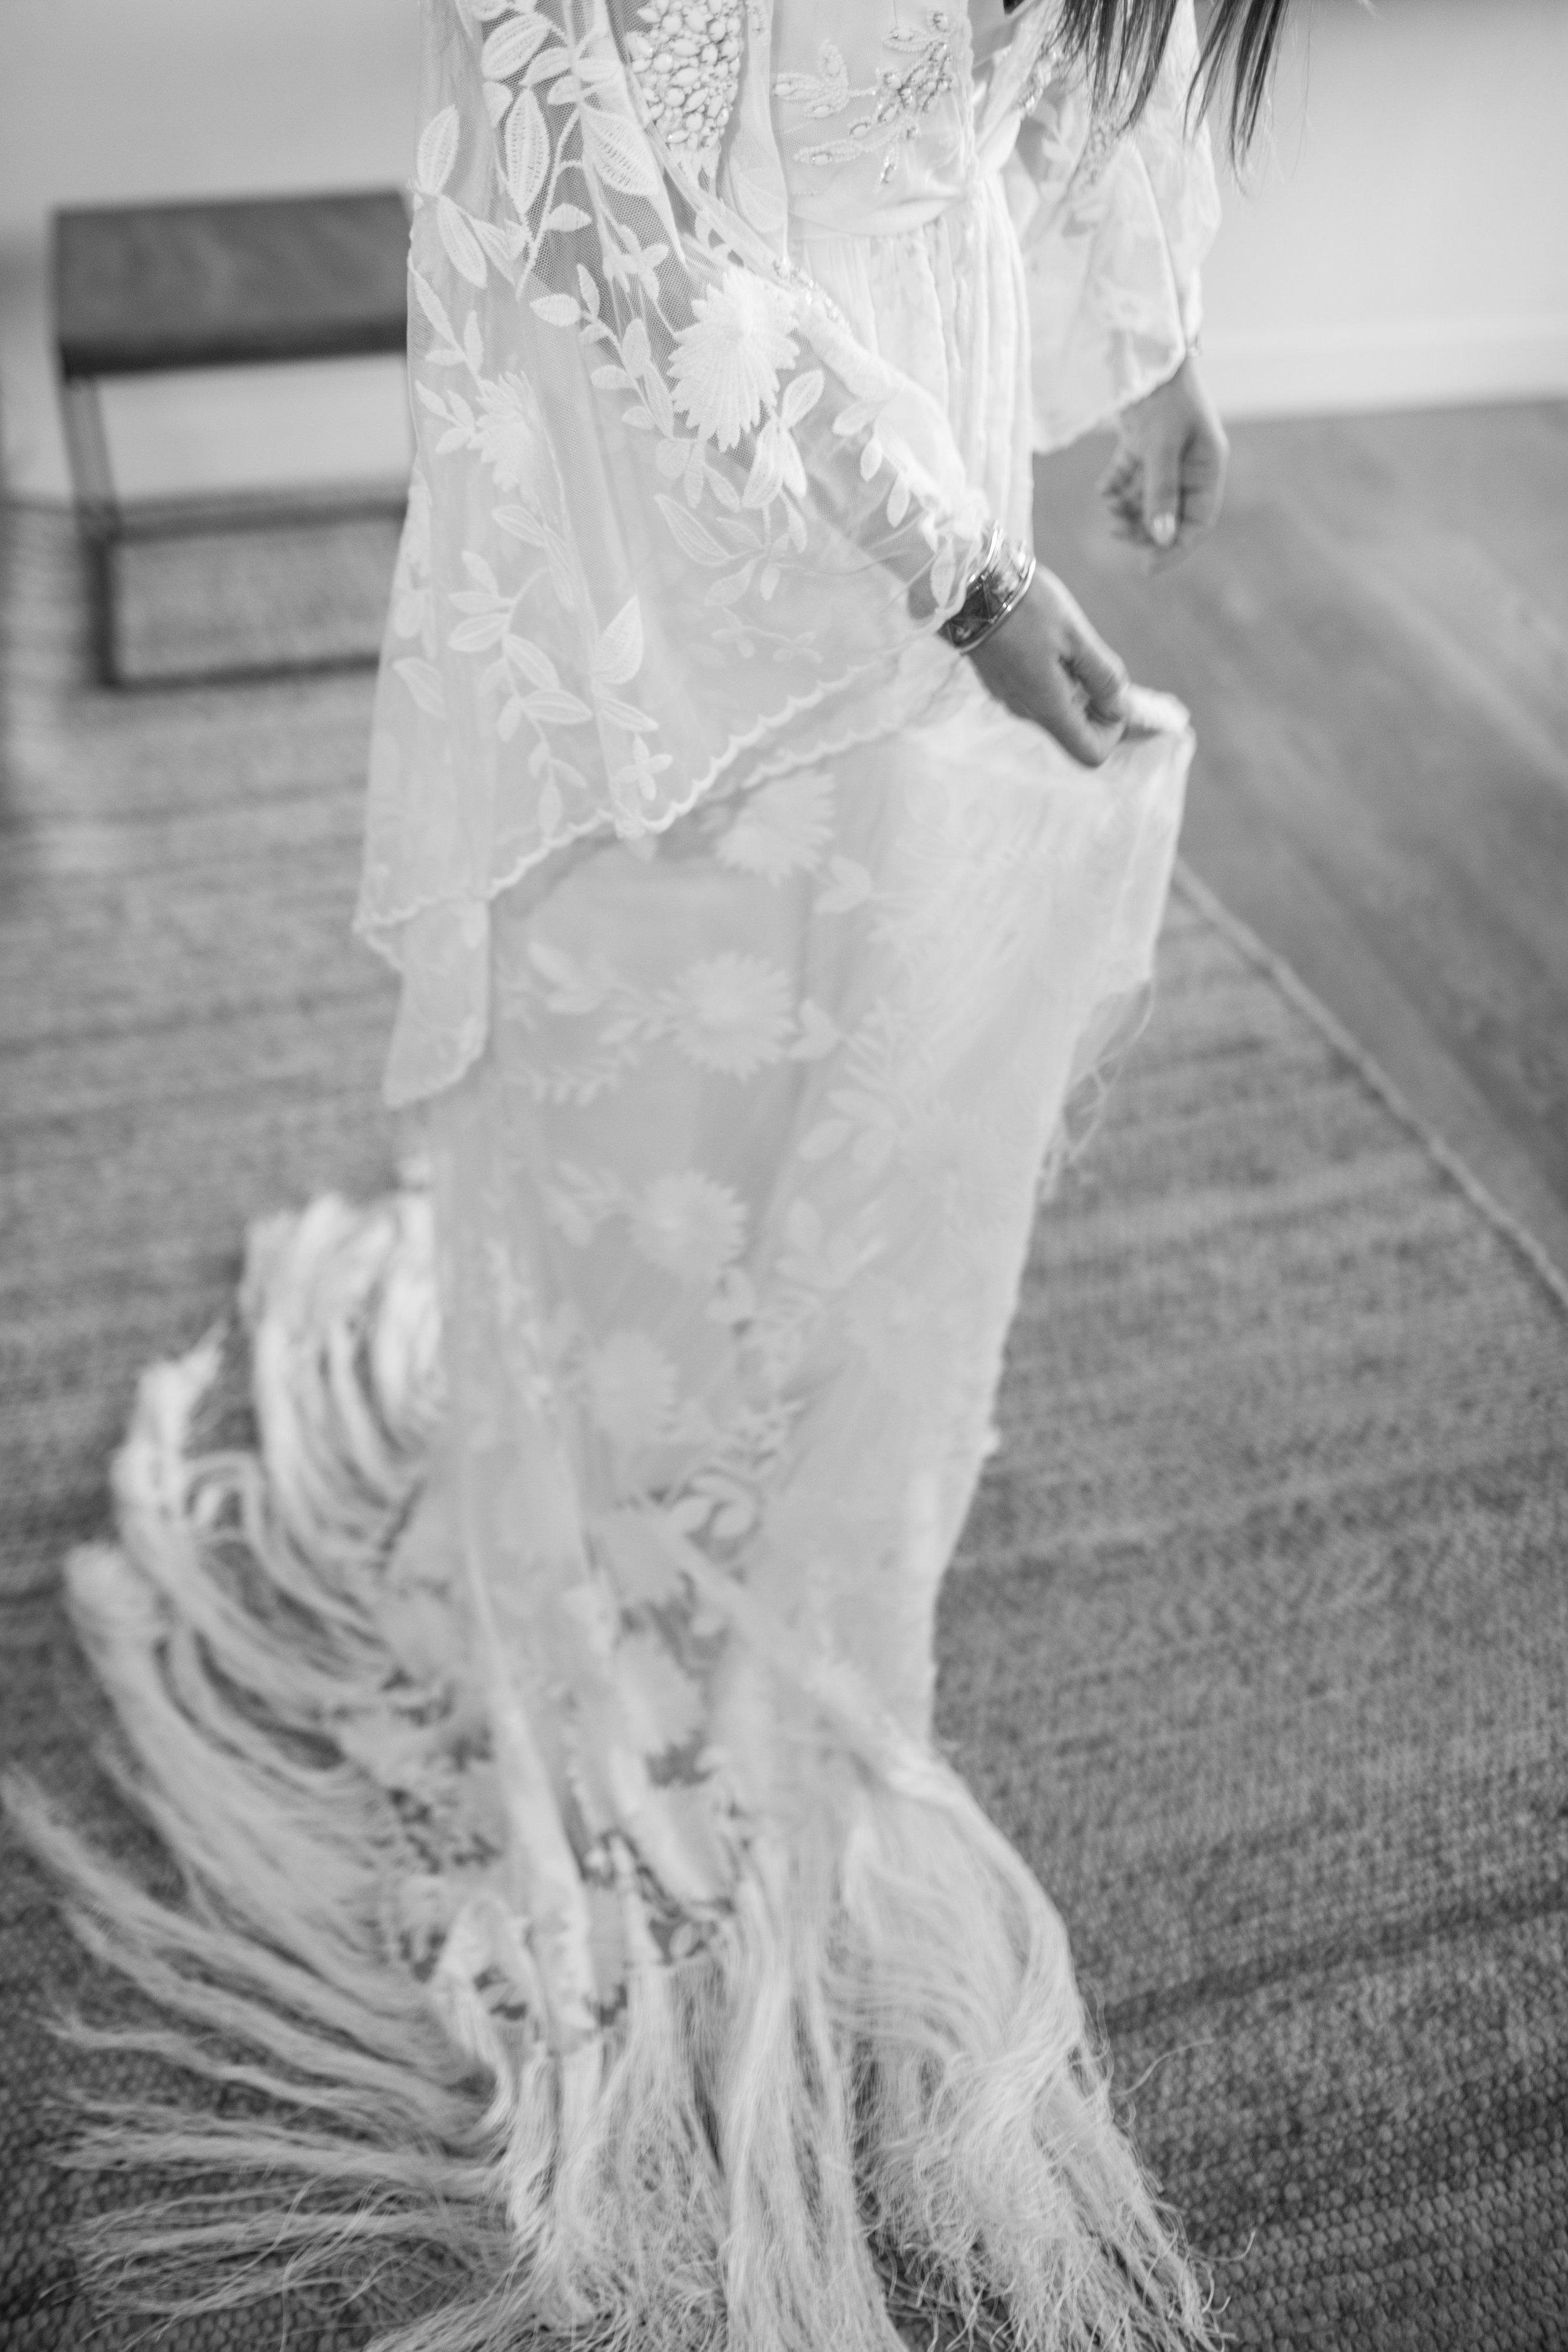 santa-barbara-elopement-elope-wedding-pop-up-coordinator-day-of-event-planning-planner-ellwood-bluff-eucalyptus-grove-rustic-ocean-view-front-hop-green-suit (1 (8).jpg